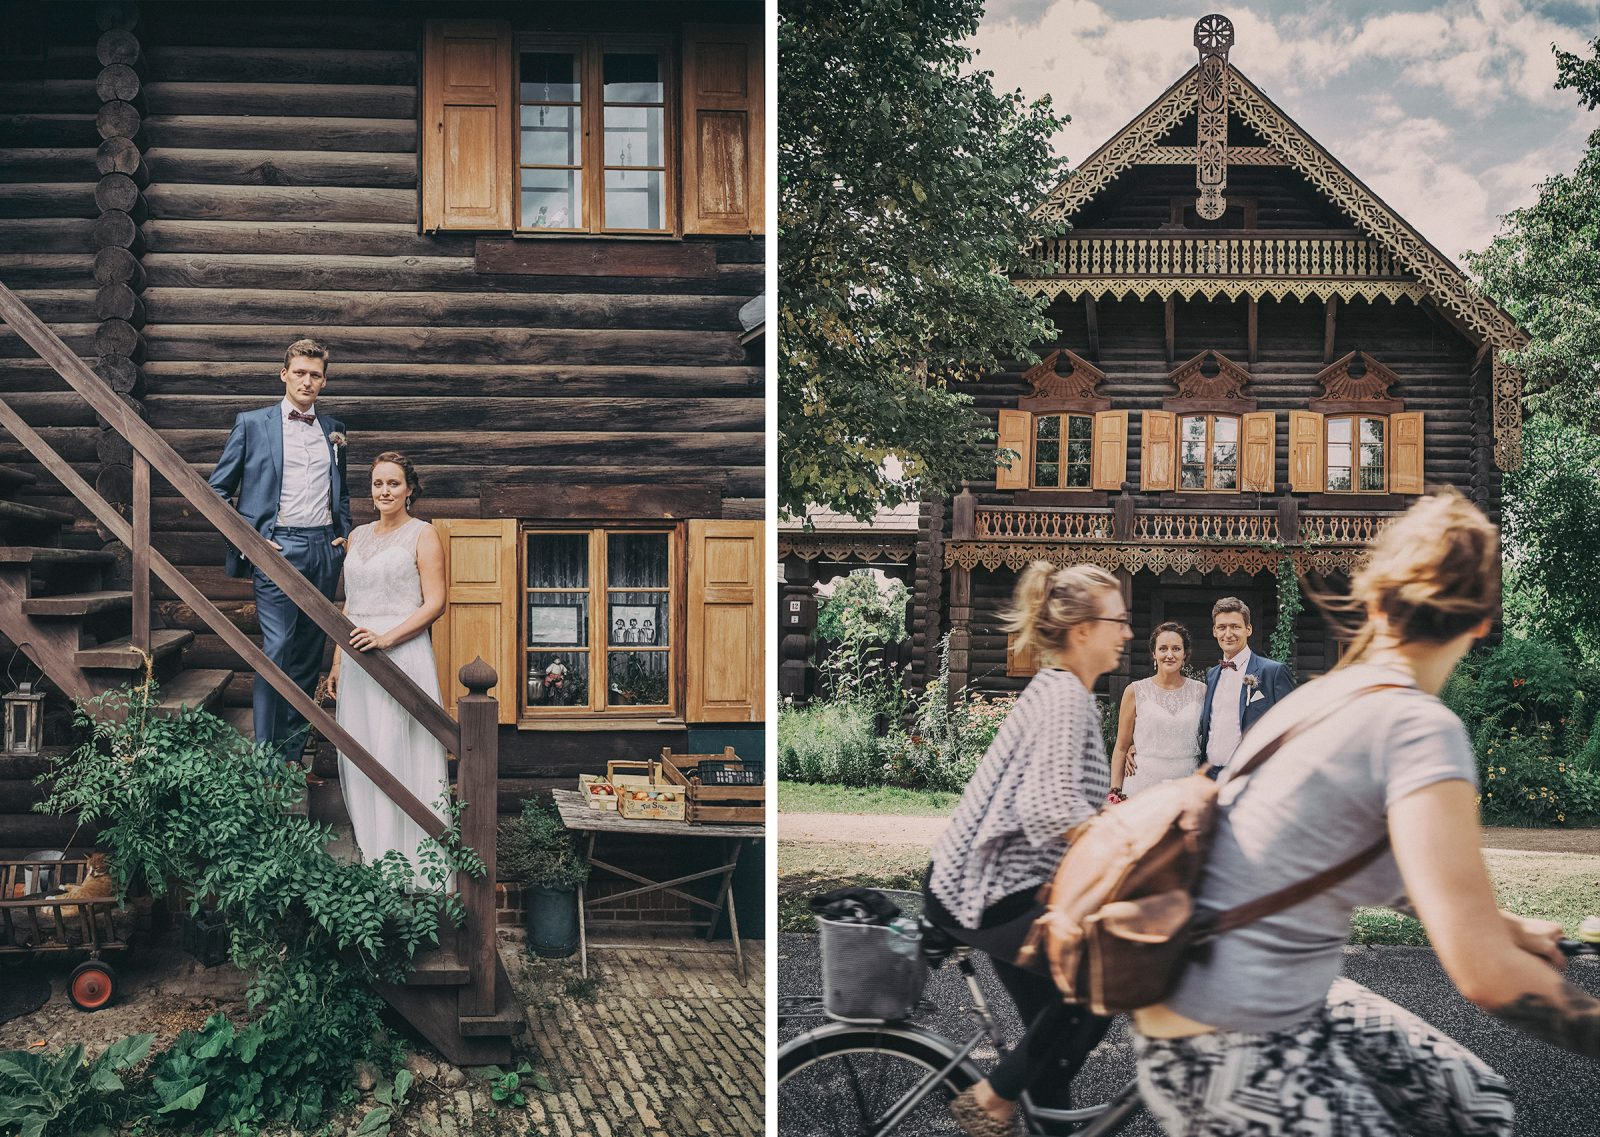 Hochzeit_Potsdam_fotograf_G25-2